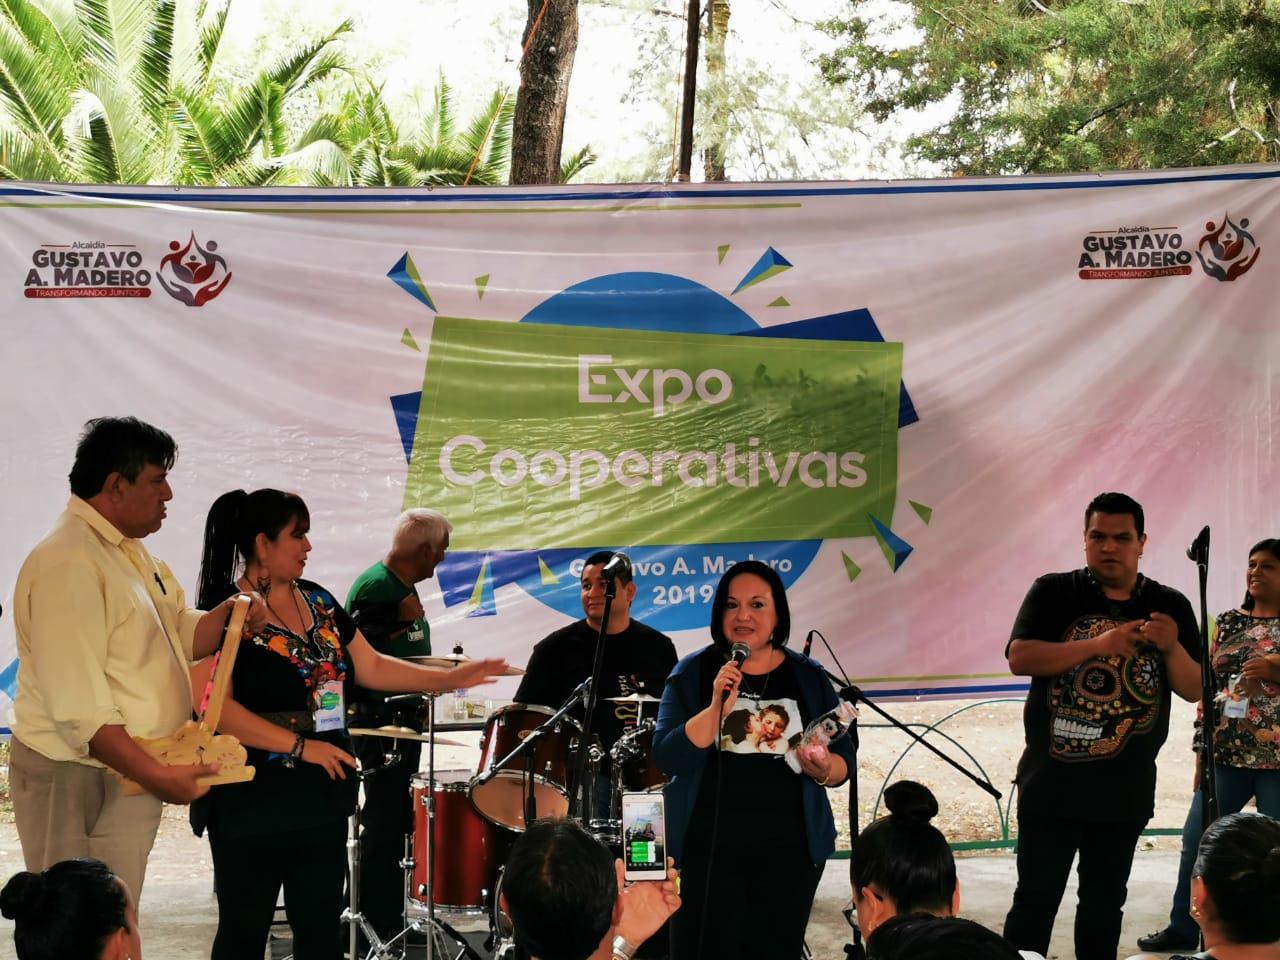 Expo_Cooperativas_2019_entrenimiento_6